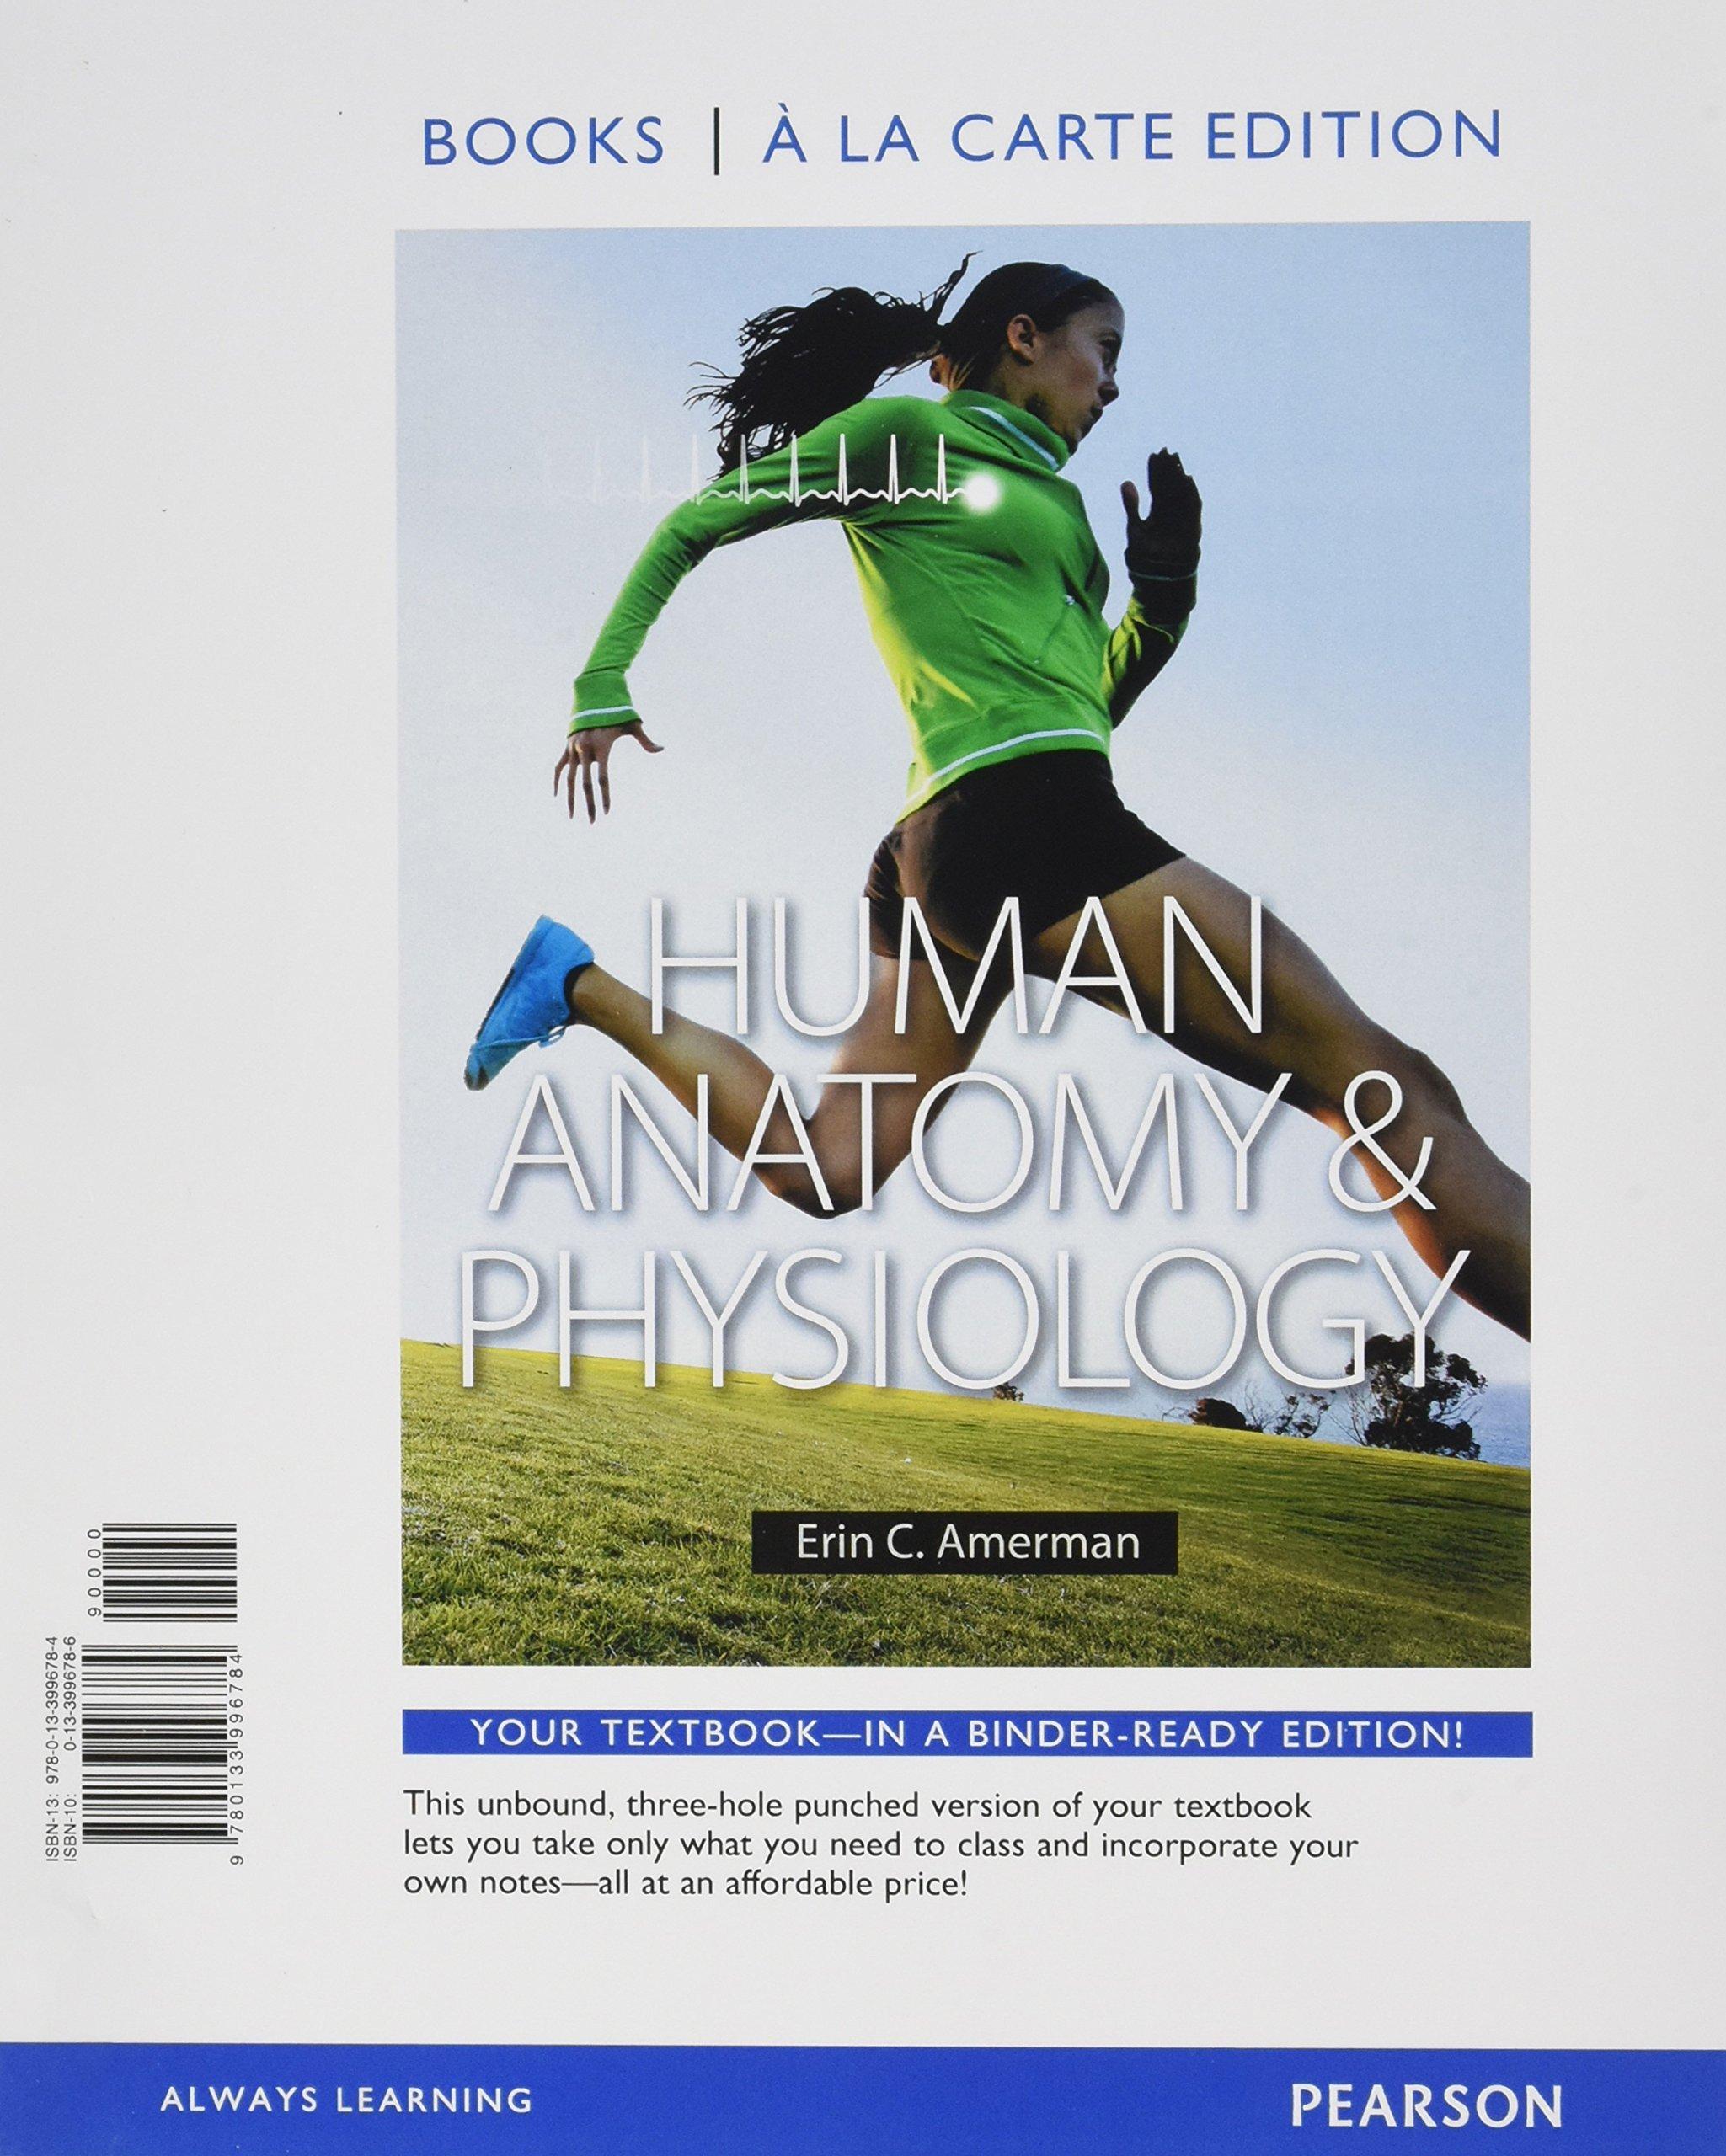 Human Anatomy & Physiology: Erin C. Amerman: Amazon.com.au: Books